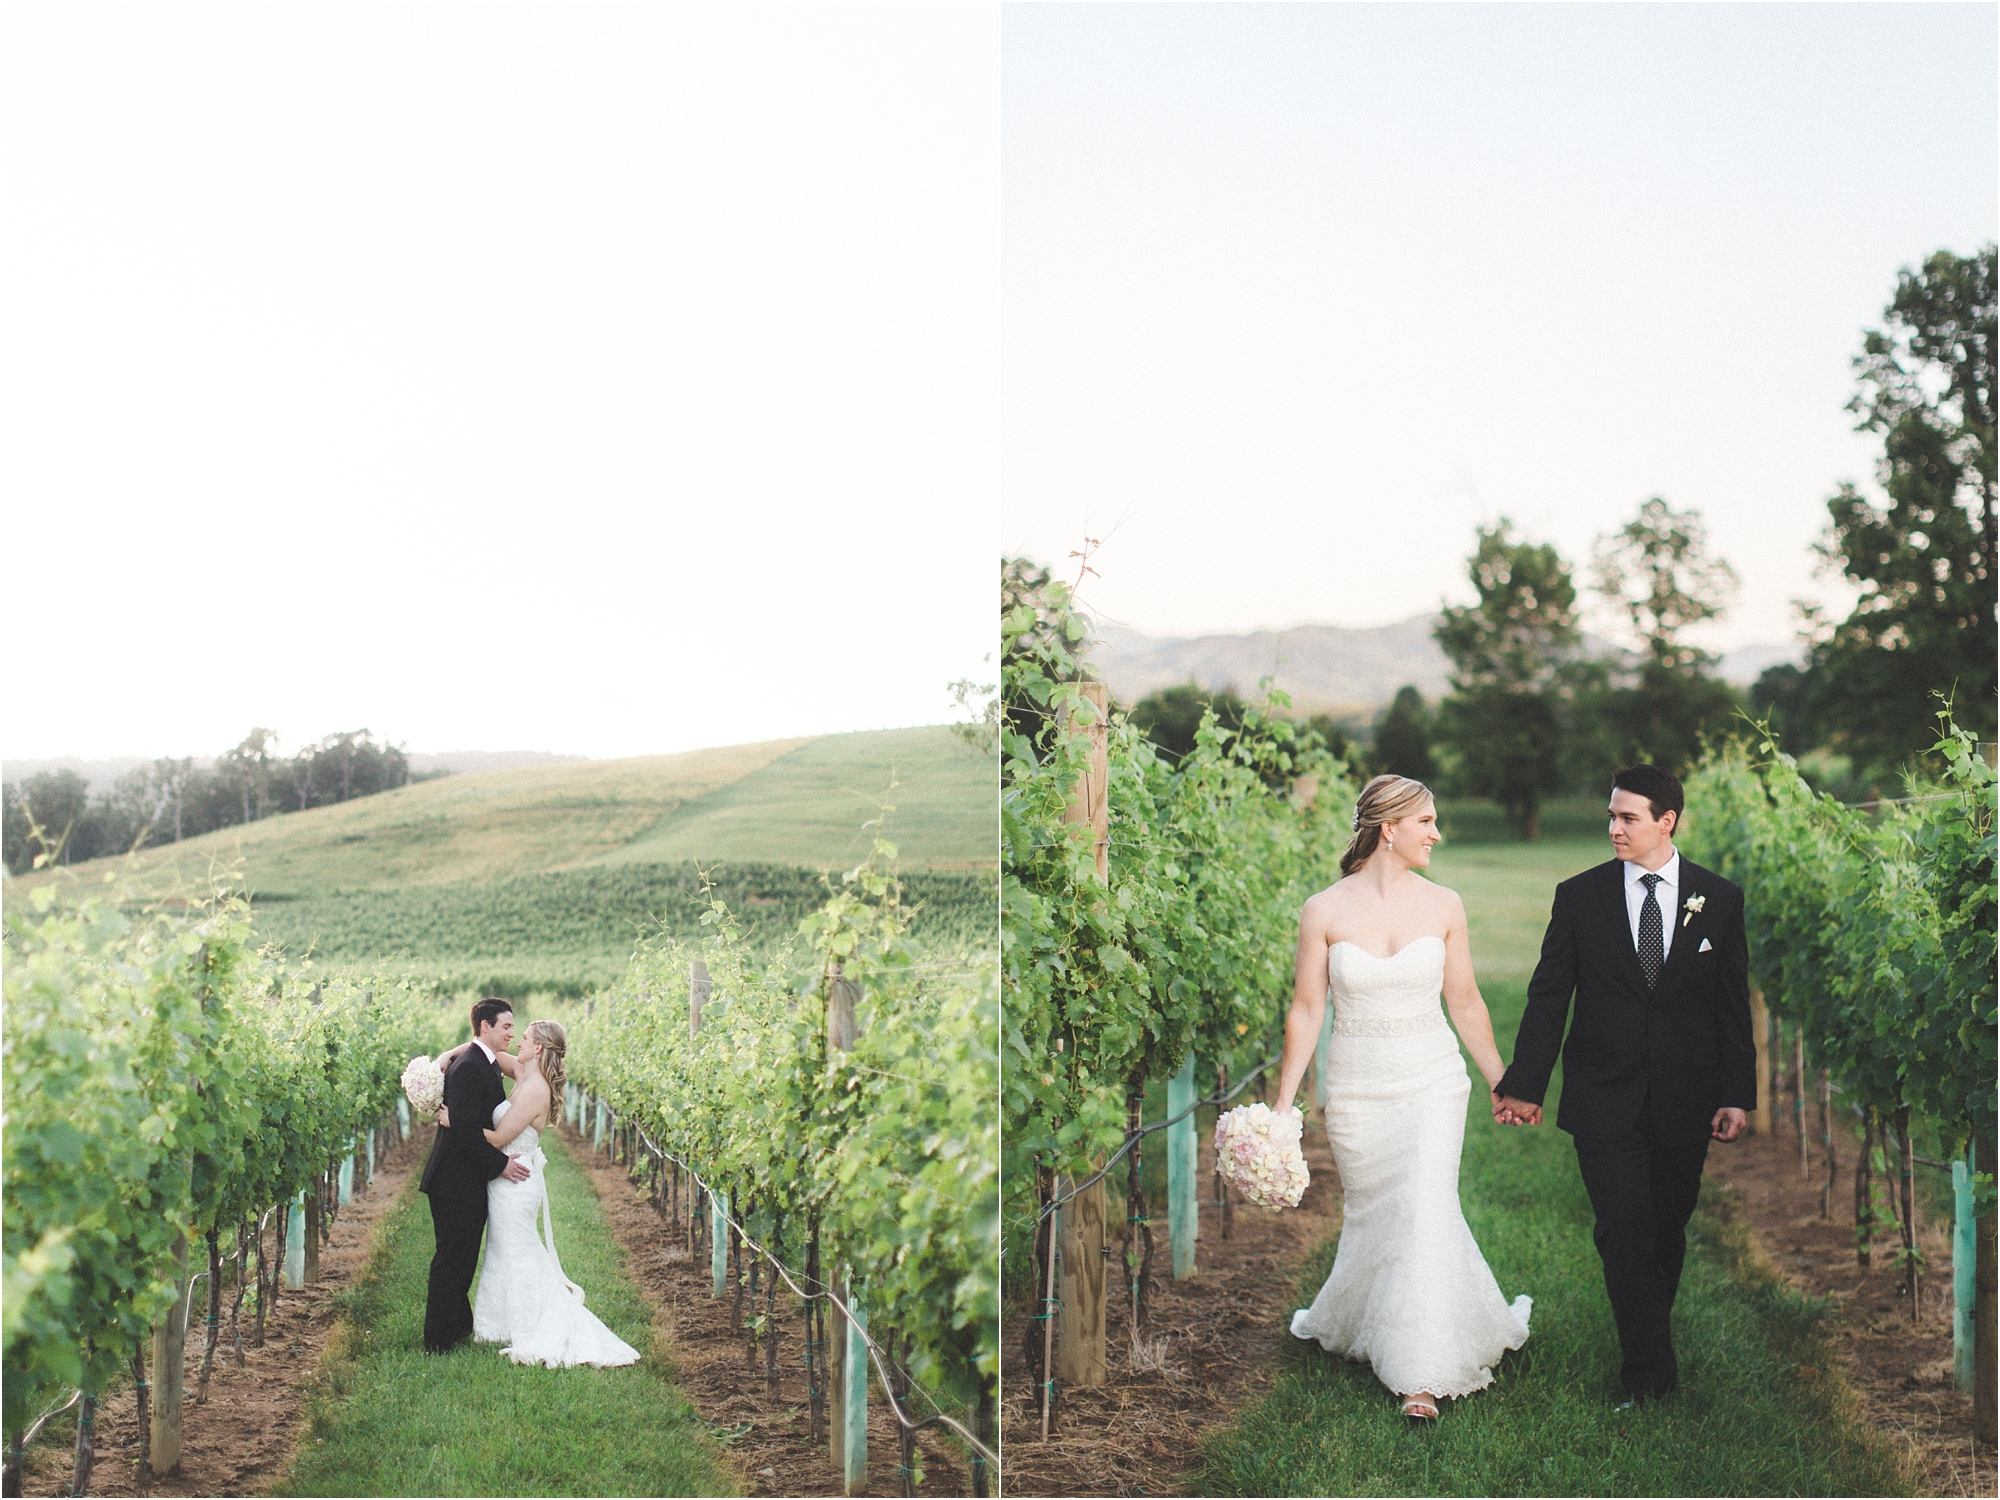 liz-mike-veritas-winery-charlottesville-virginia-wedding-photos_0031.jpg